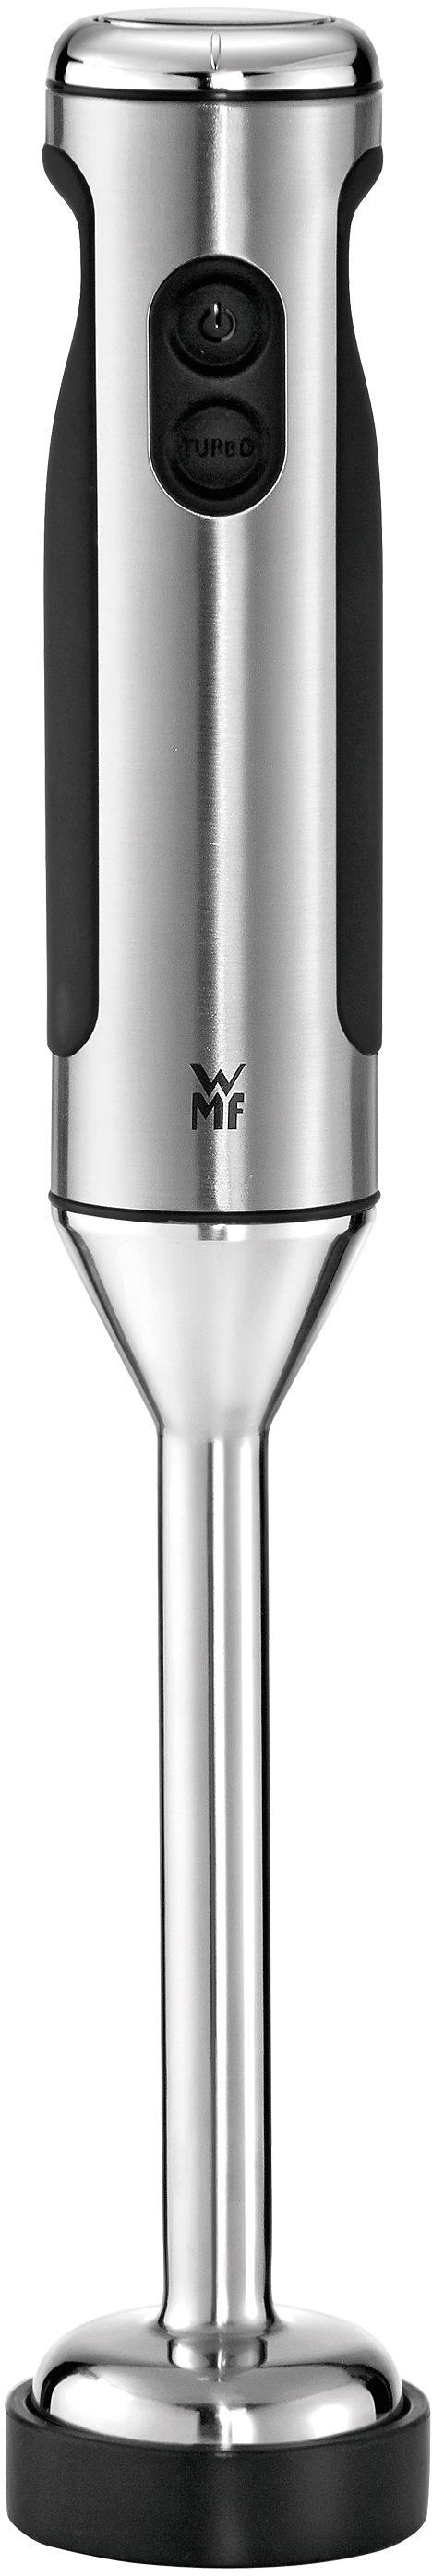 WMF Stabmixer Lineo, 700 Watt